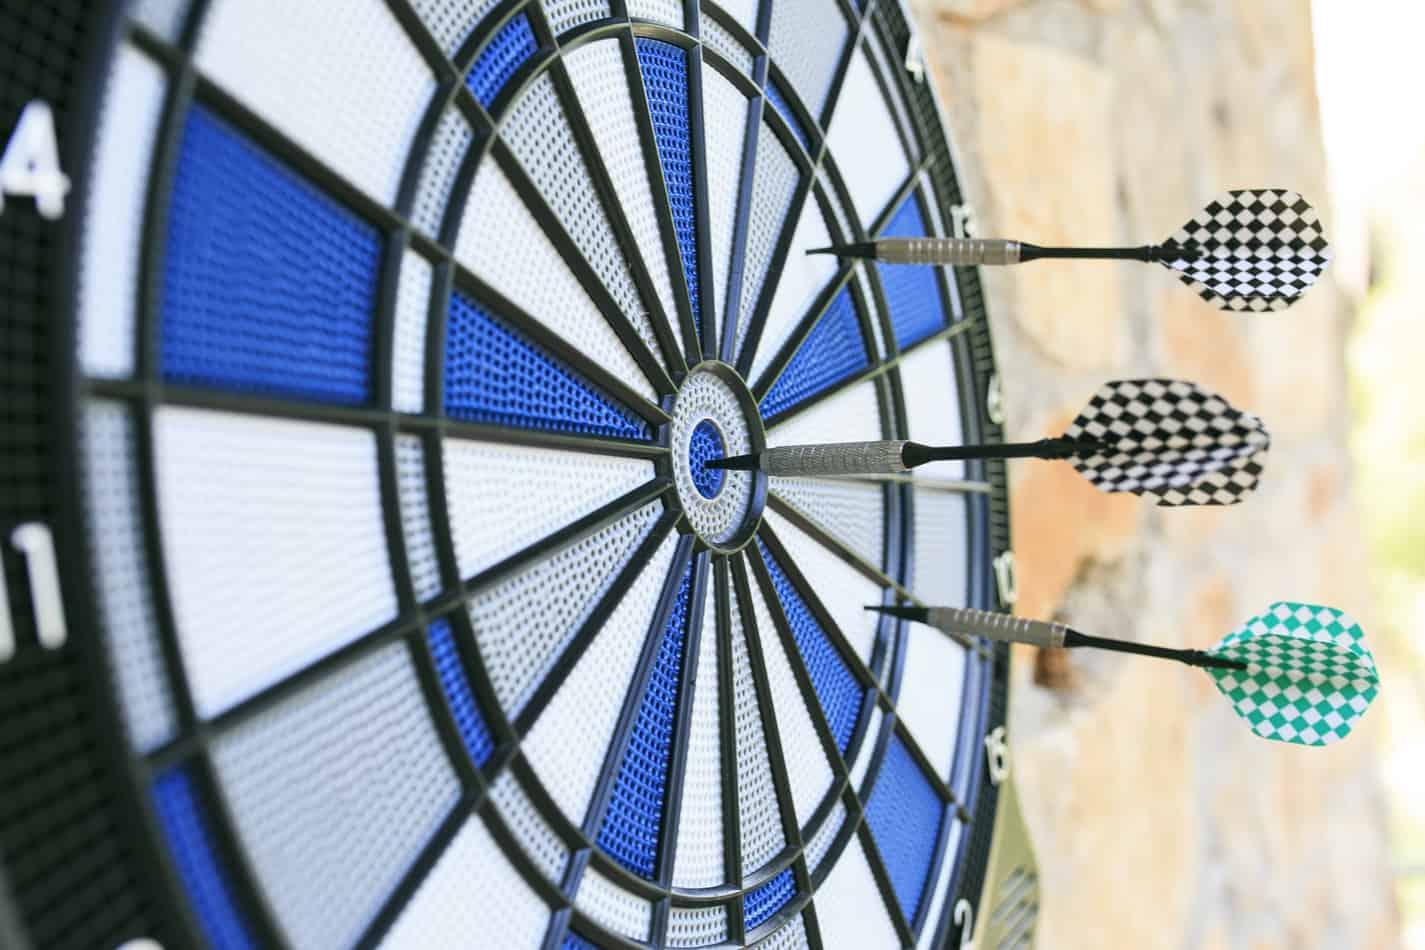 how to play bermuda triangle darts